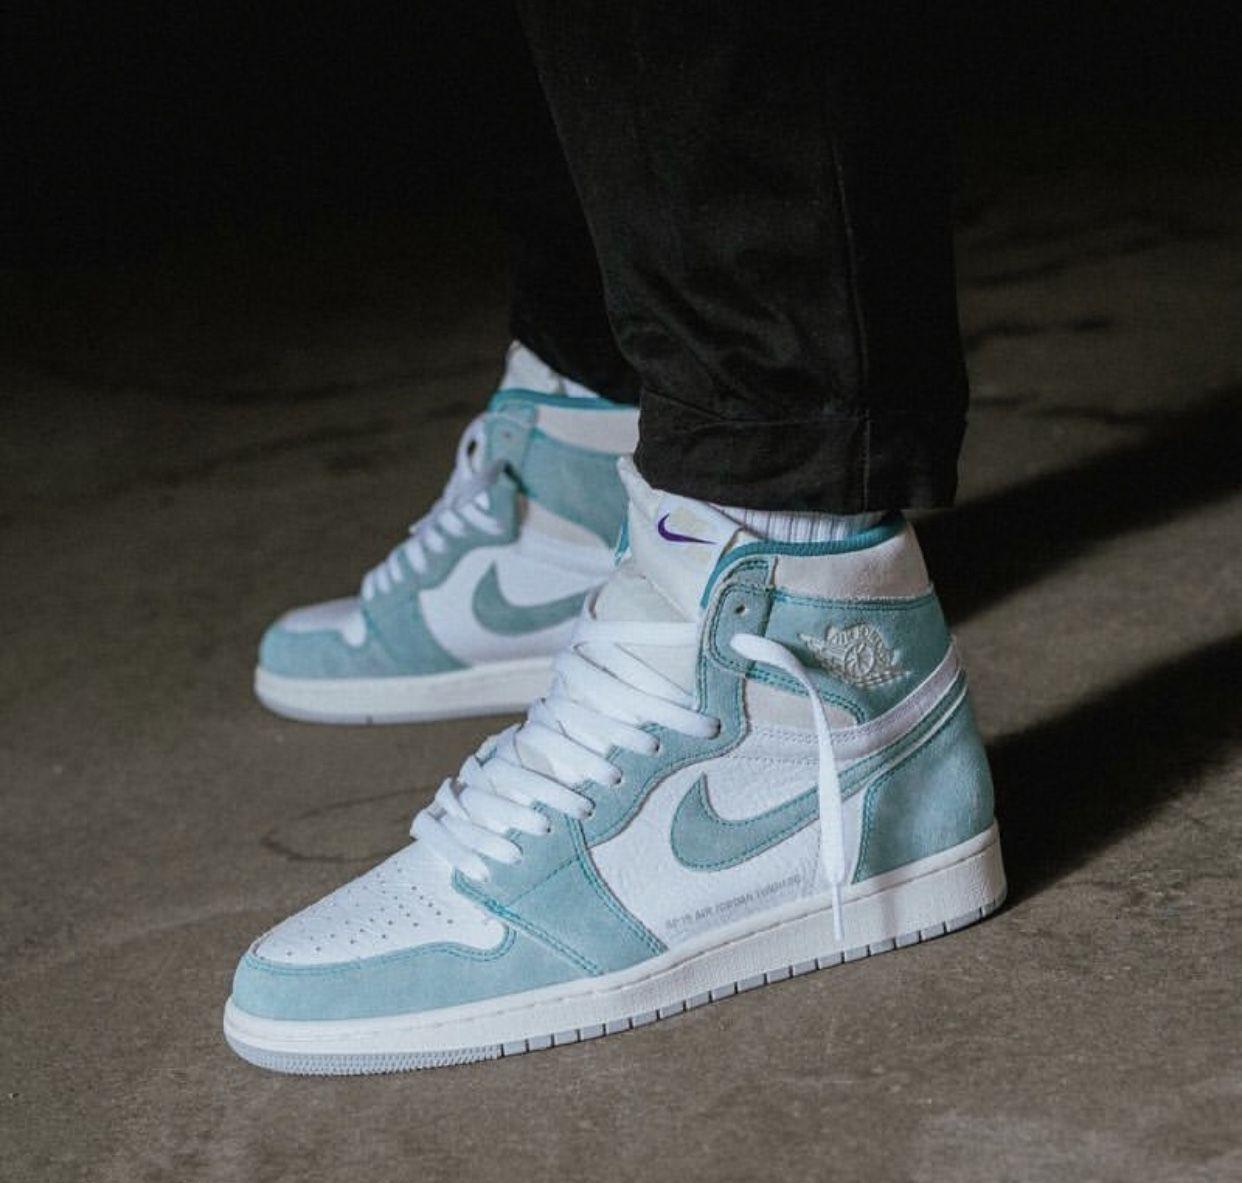 Jordan 1 Retro High Og Turbo Green With Images Sneakers